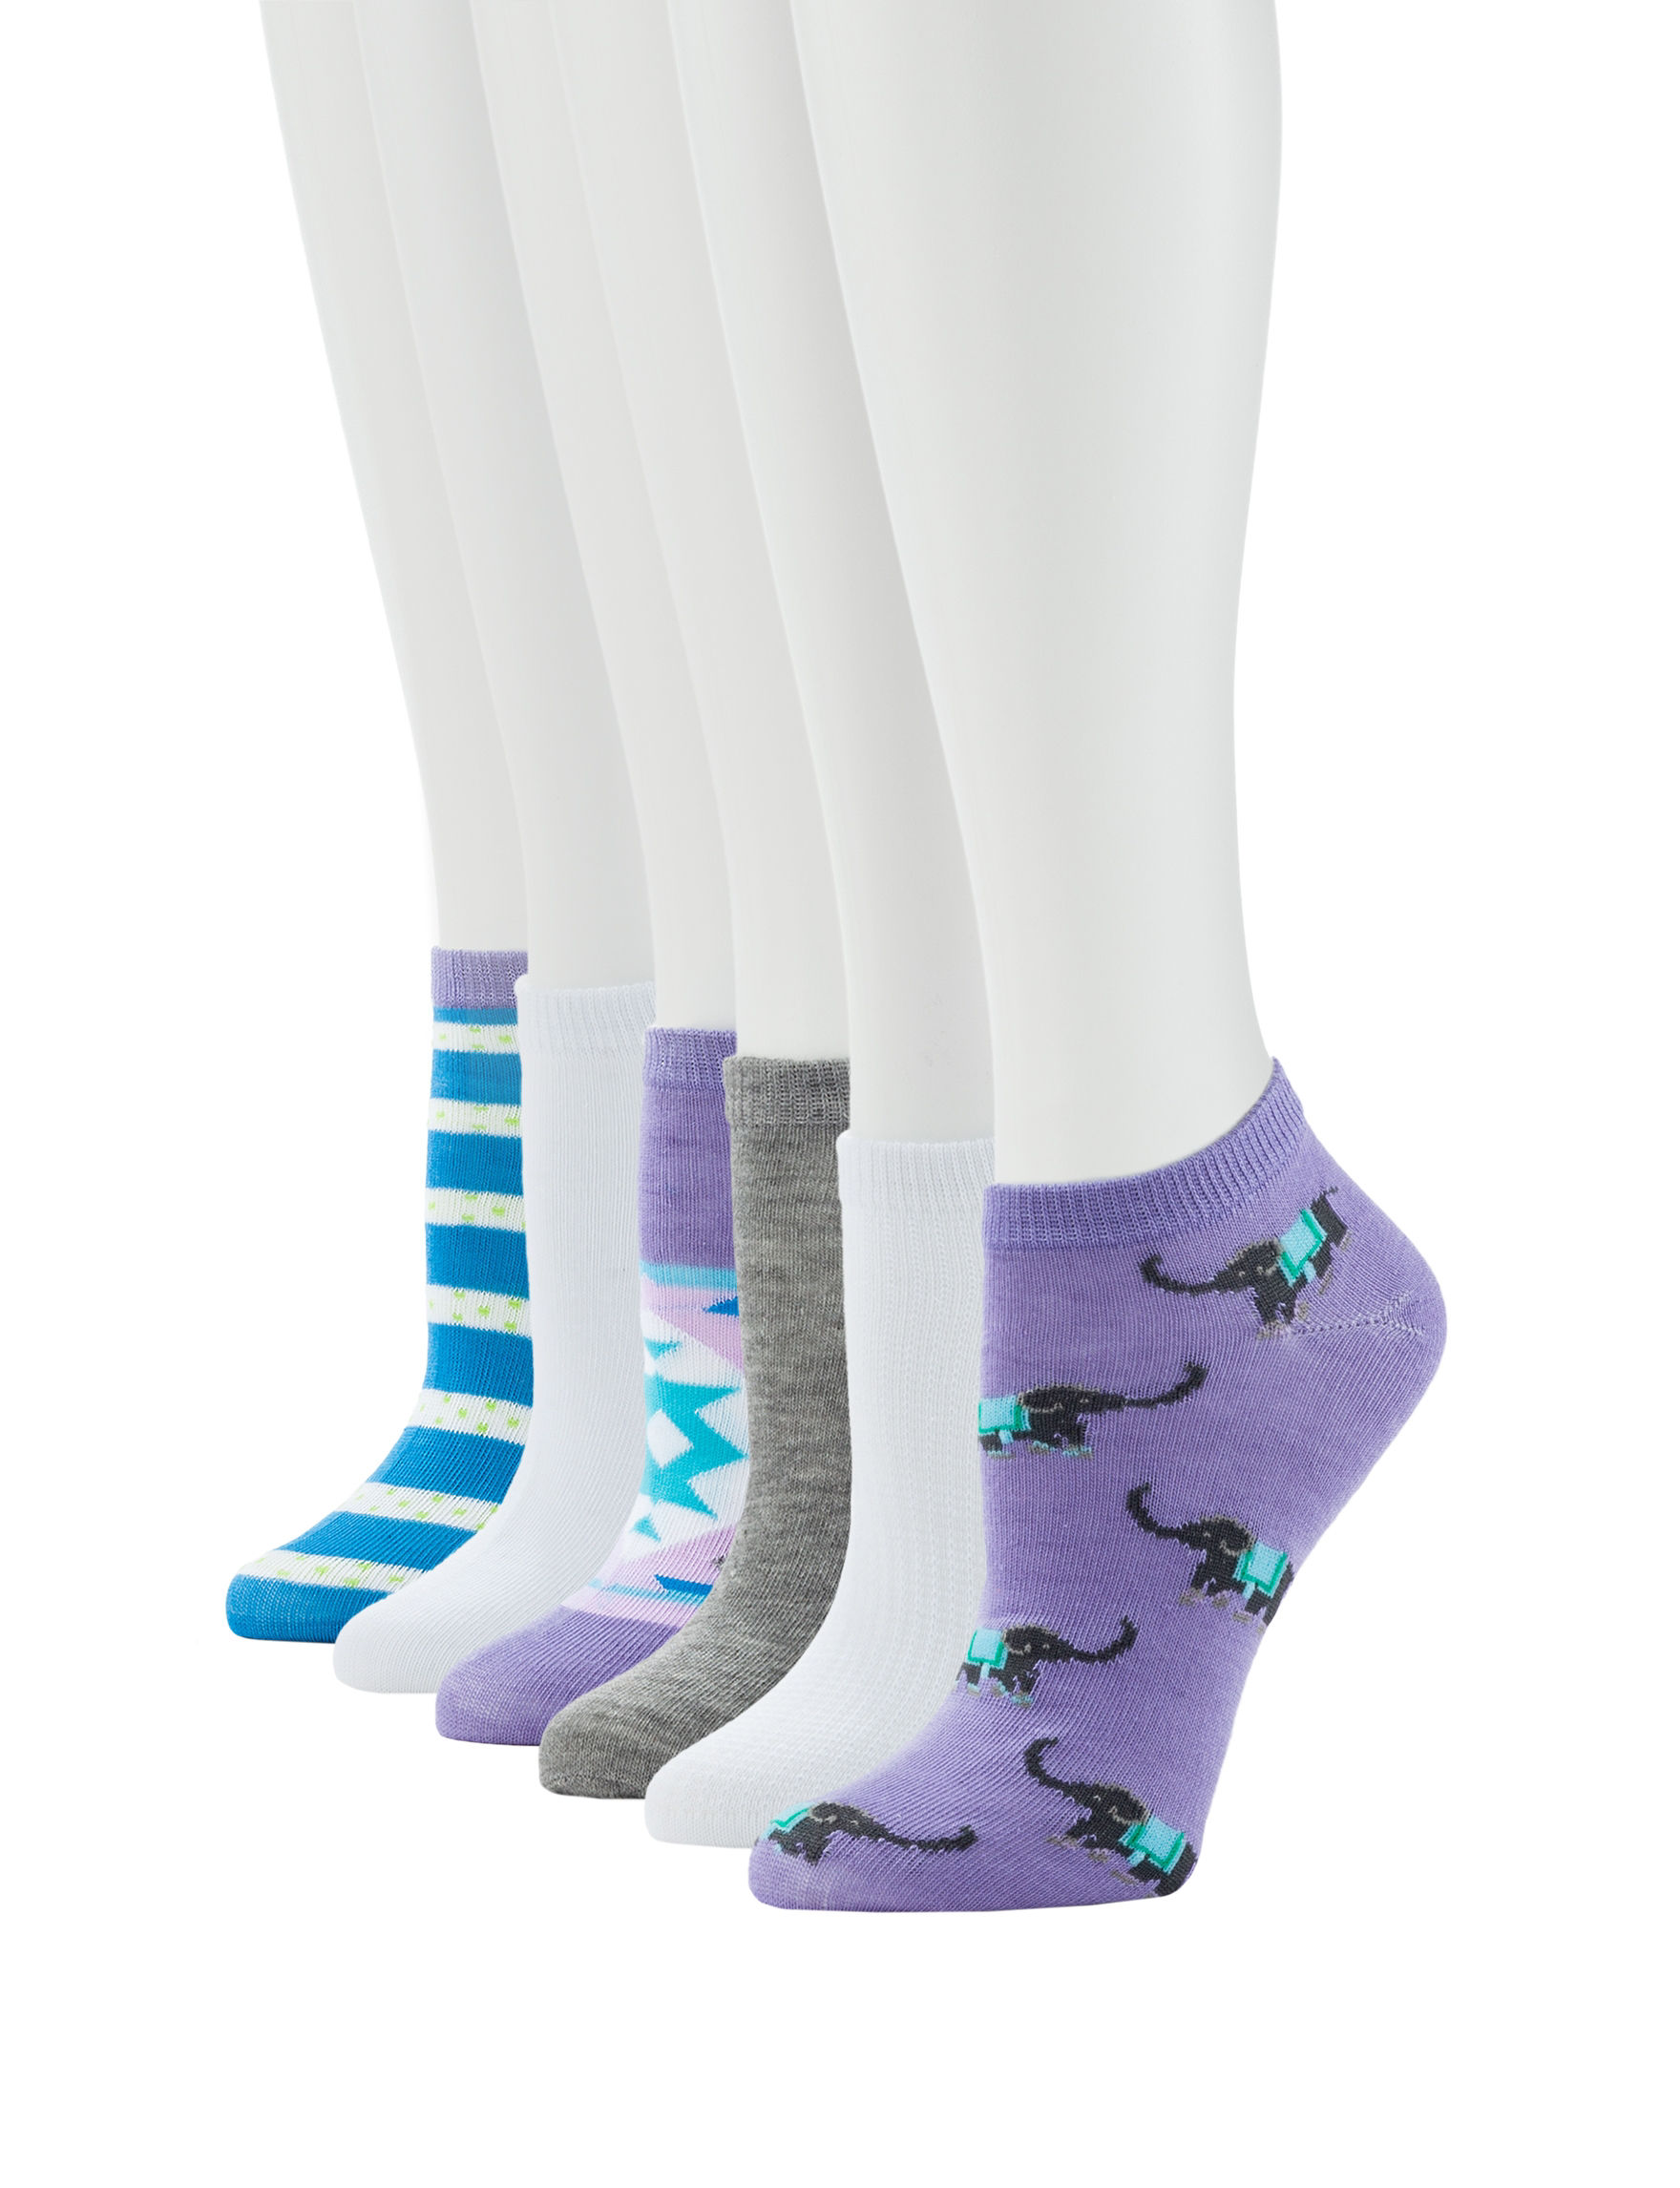 Signature Studio White Socks